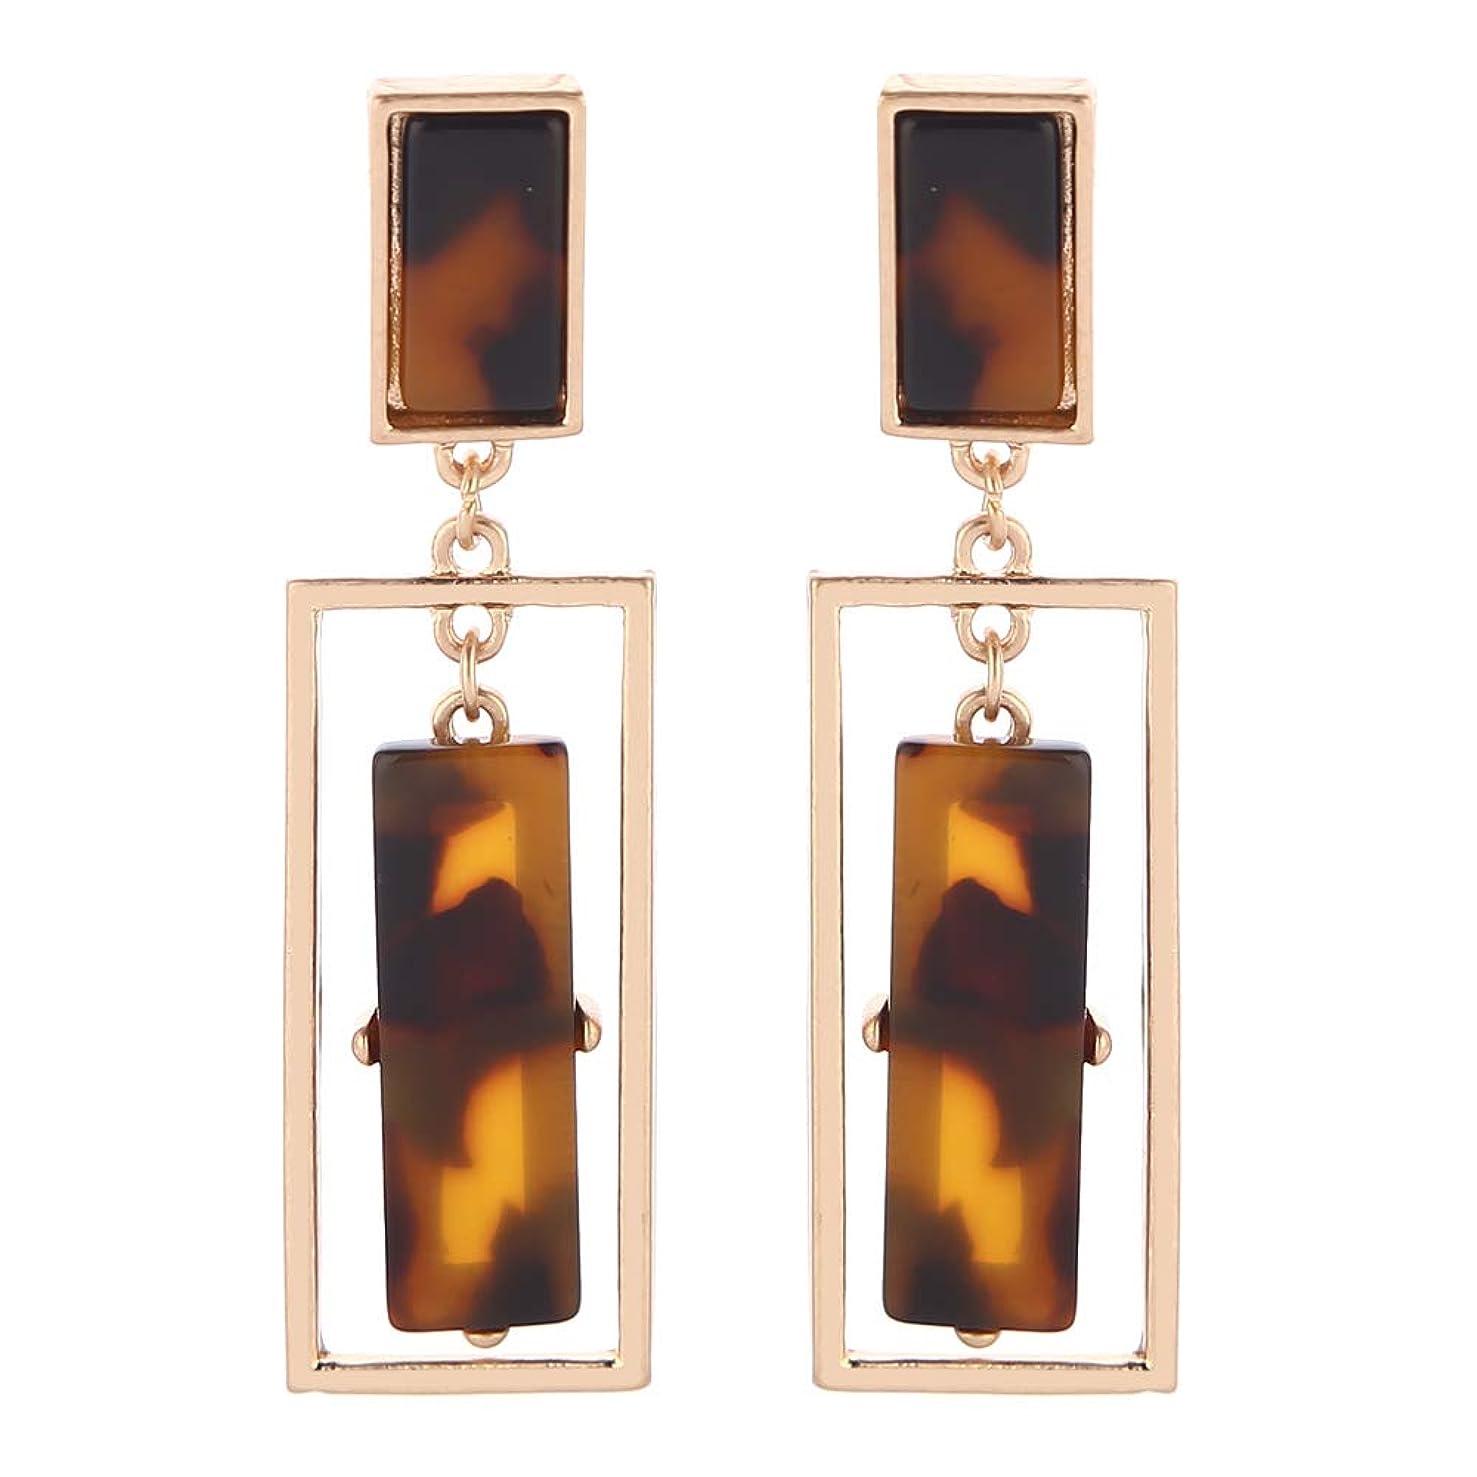 Eran Fashions Acrylic Earrings Women's Cellulose Acetate Earrings Geometric Double Rectangle Dangle Earrings